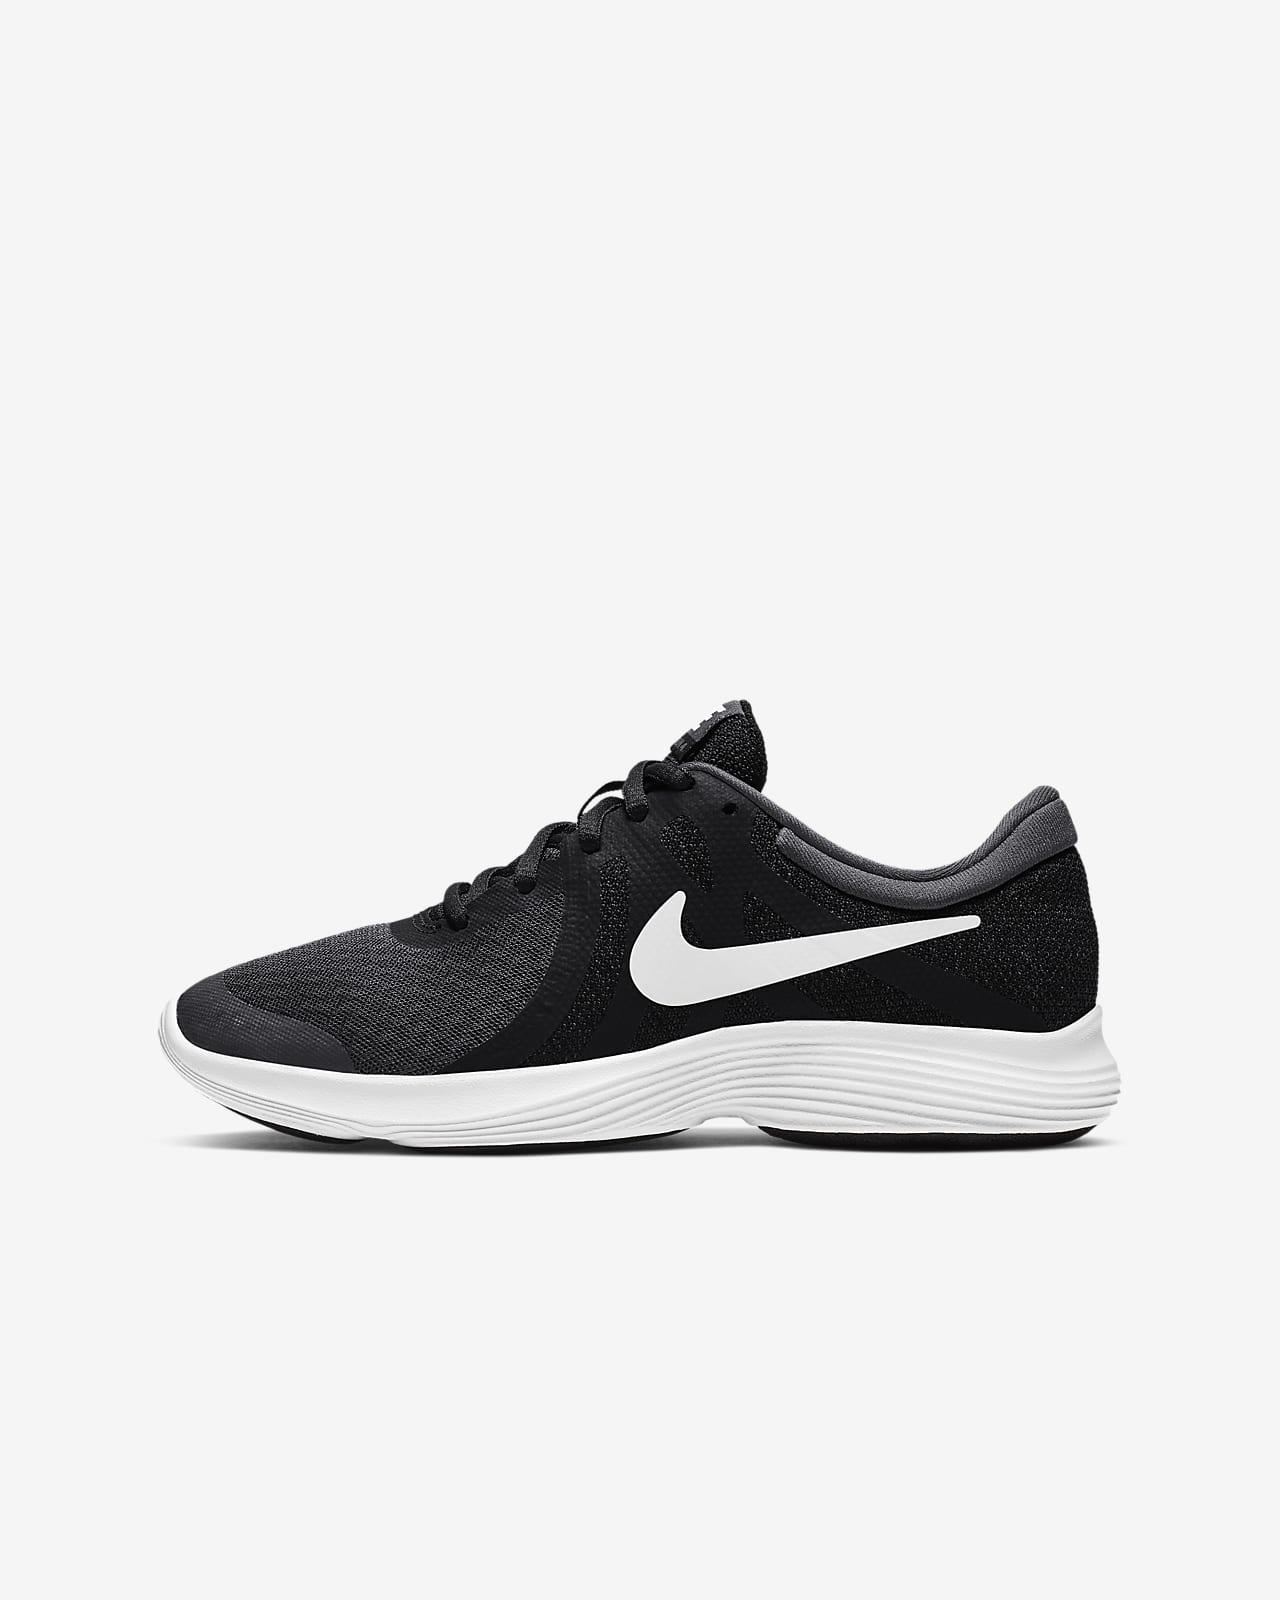 Running Shoe.Online store